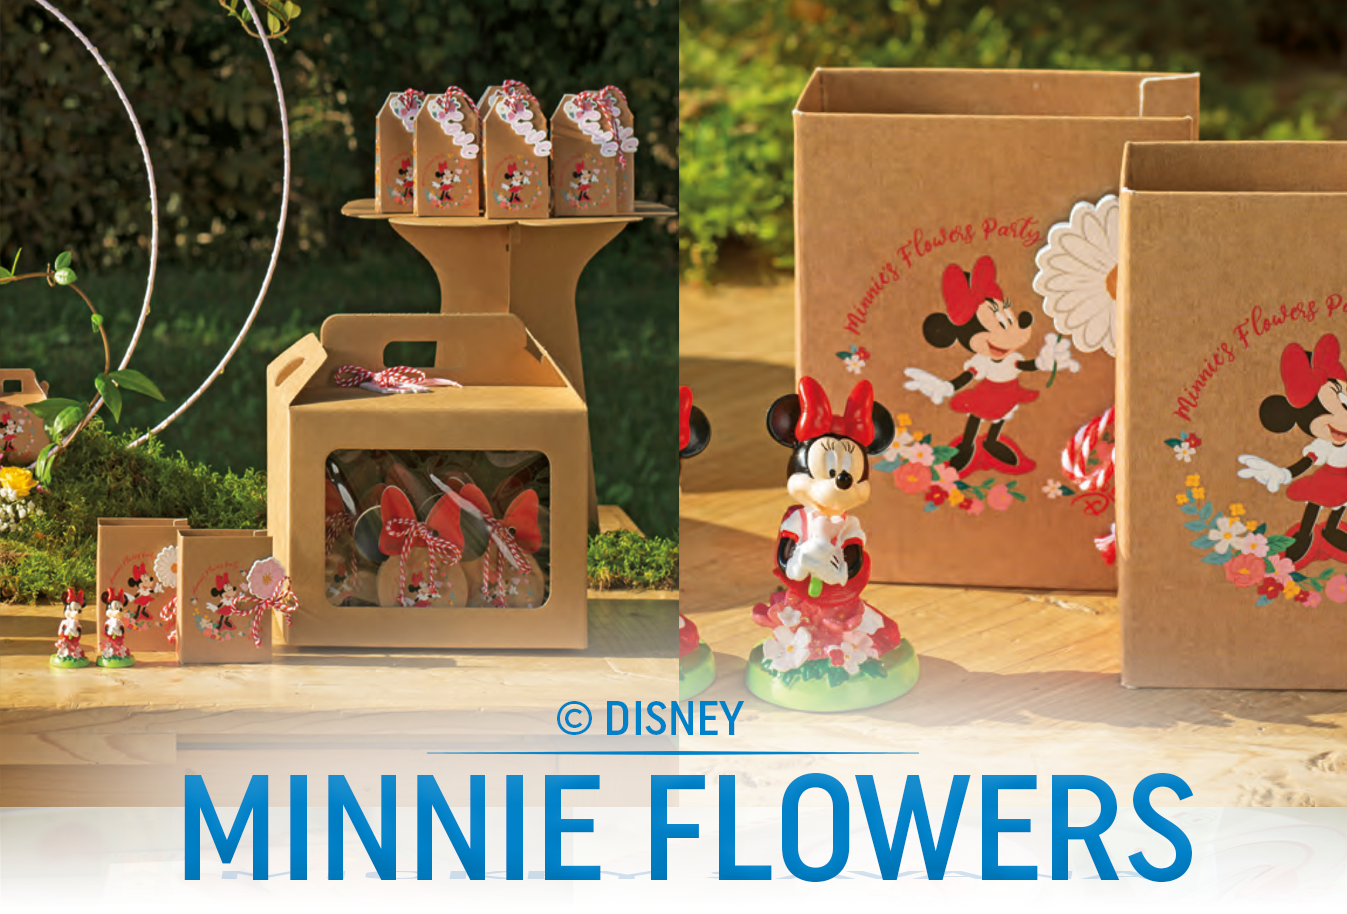 kategorie-minnieflowers